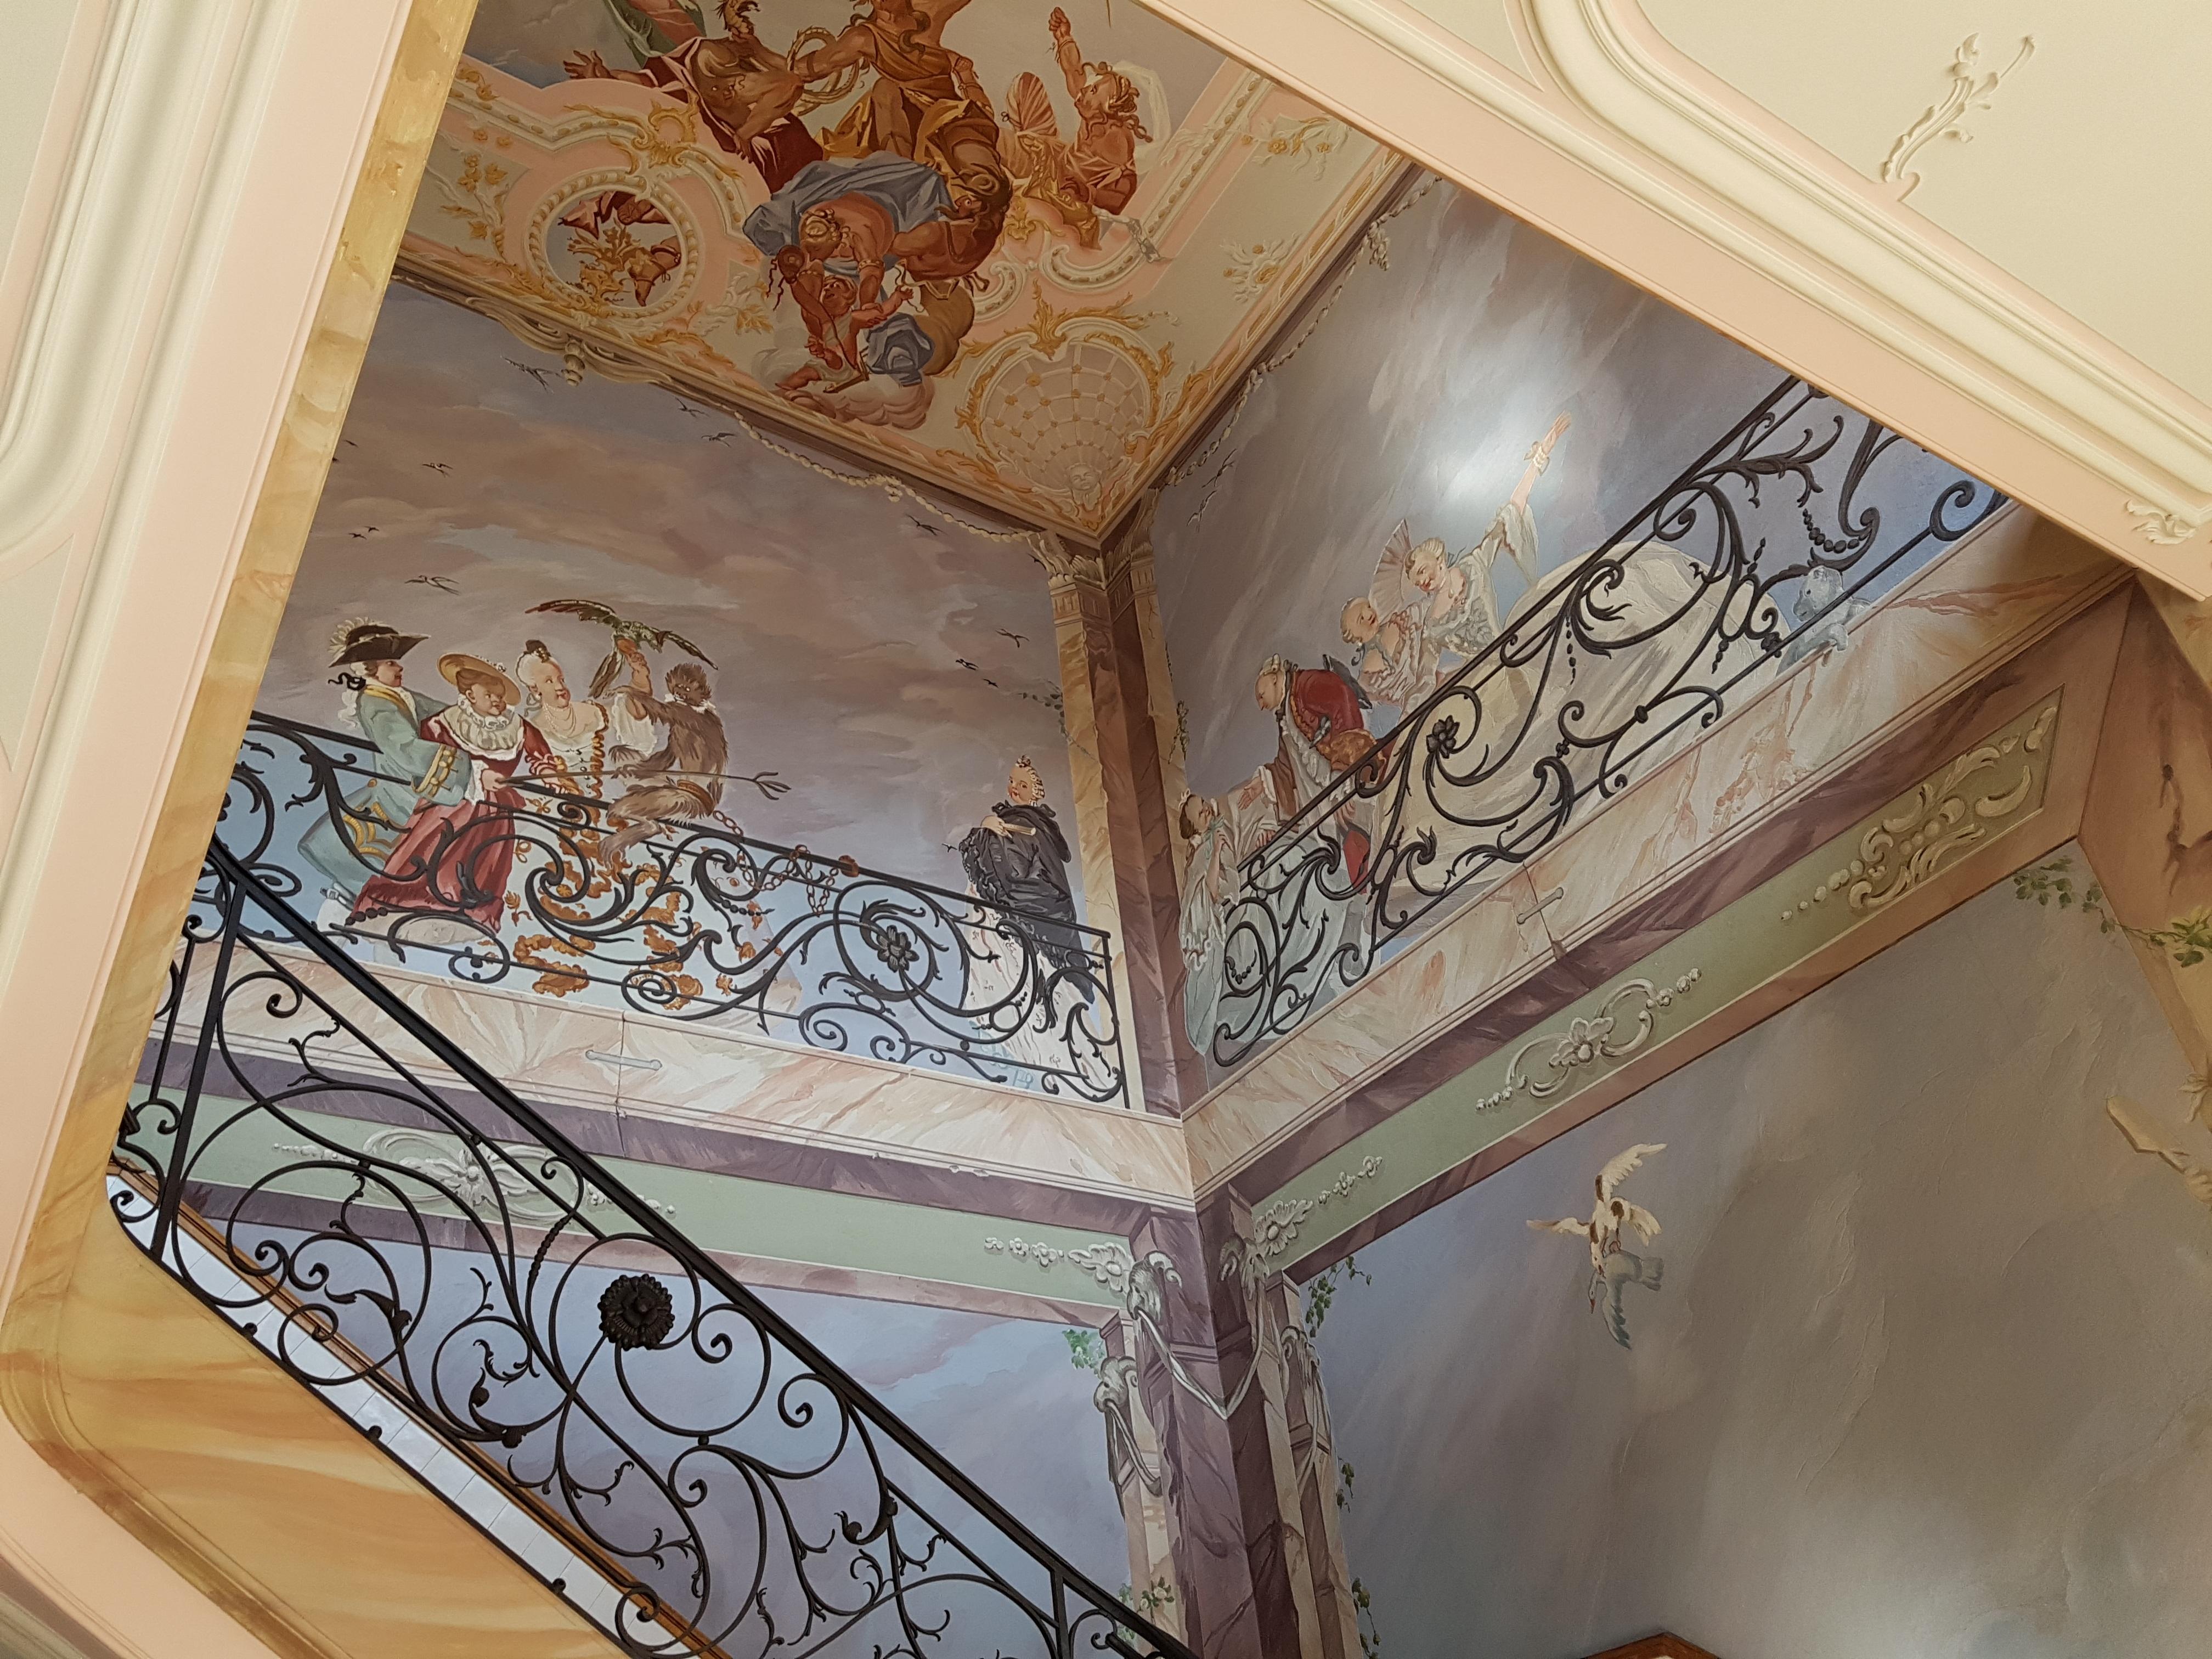 fotos gratis madera casa piso ventana vaso edificio pared escalera techo habitacin material obra de arte pintura ornamento